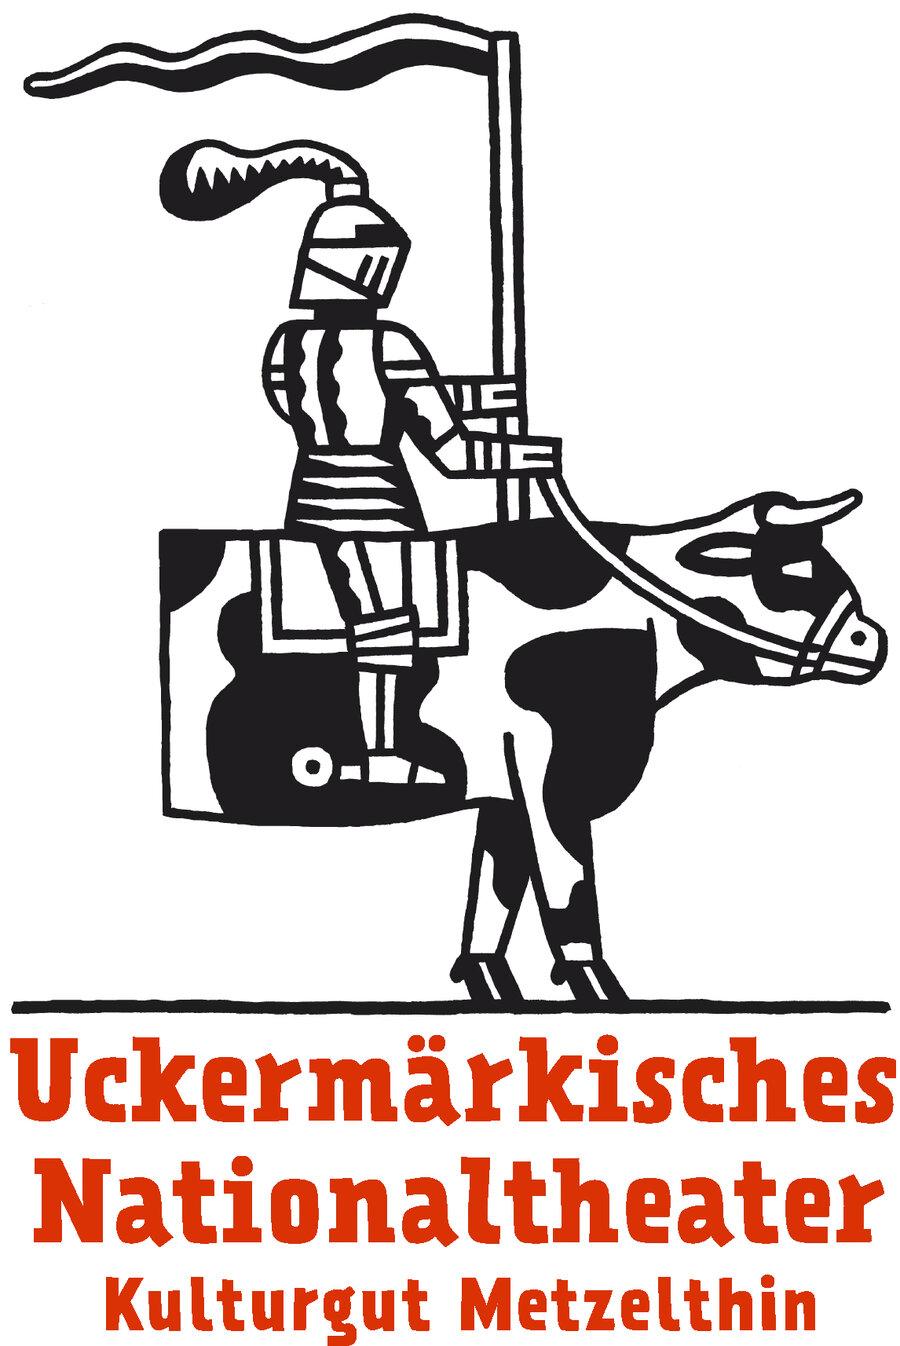 Halbe_Kuh_Logo_rot